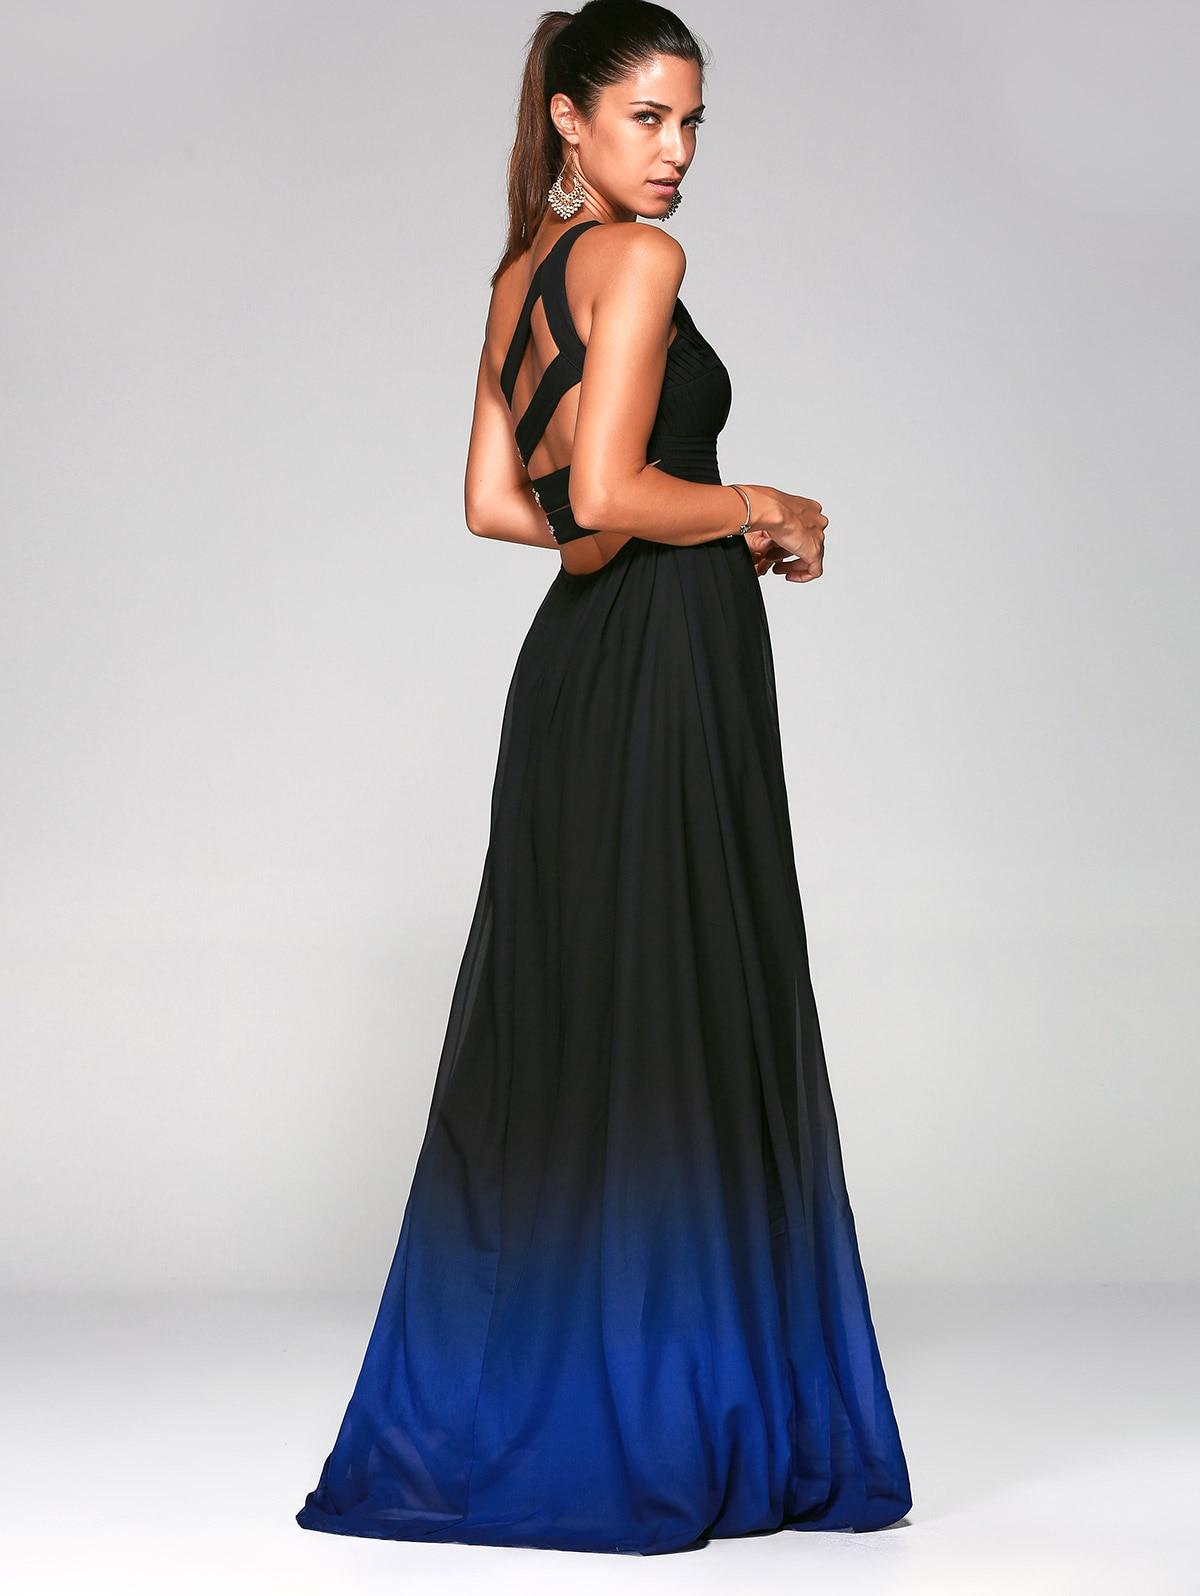 Ombre Long Formal Dresses